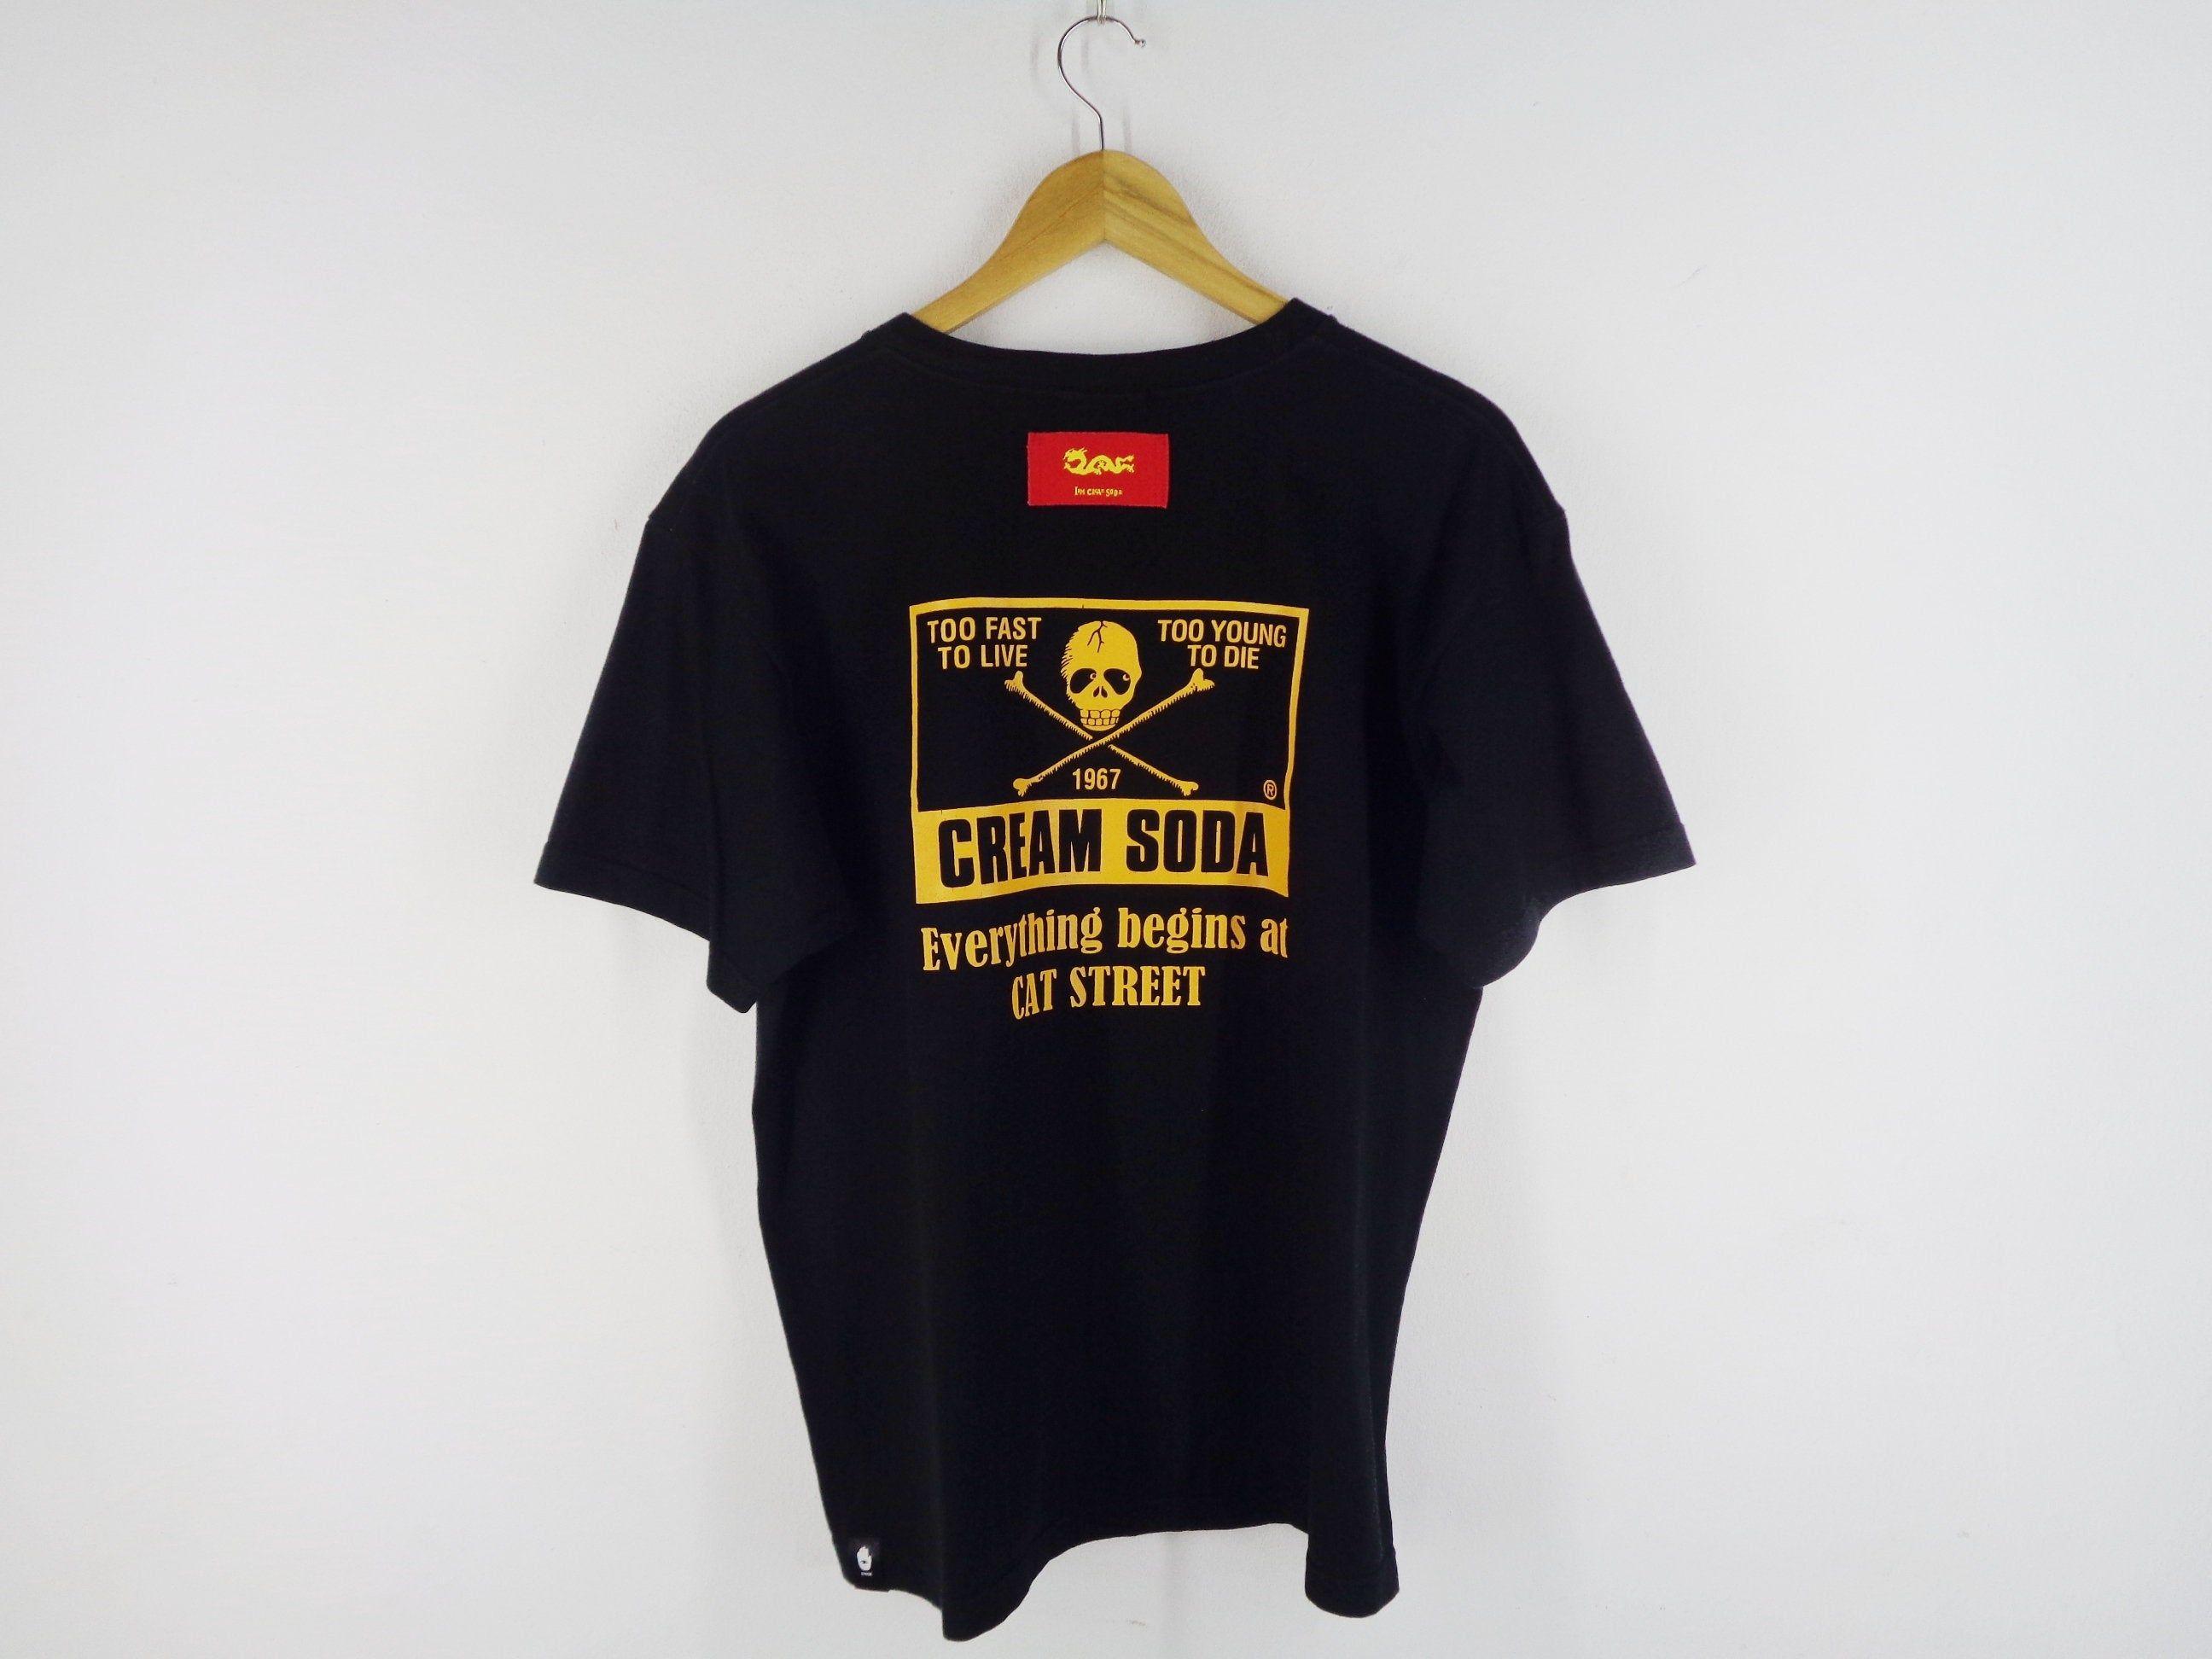 Cream Soda Shirt Cream Soda T Shirt Cream Soda South Side Cat Etsy Shirts Cream Soda T Shirt